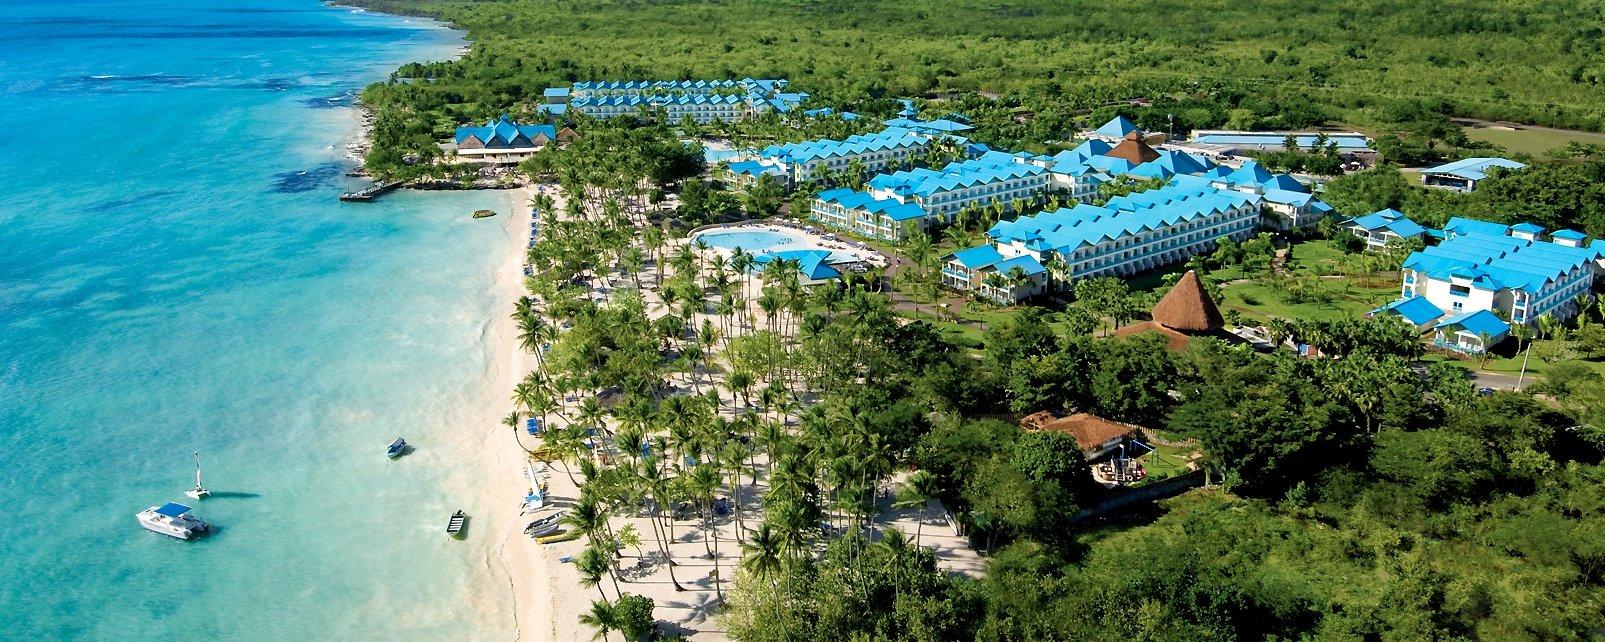 Hôtel Dreams La Romana Resort & Spa